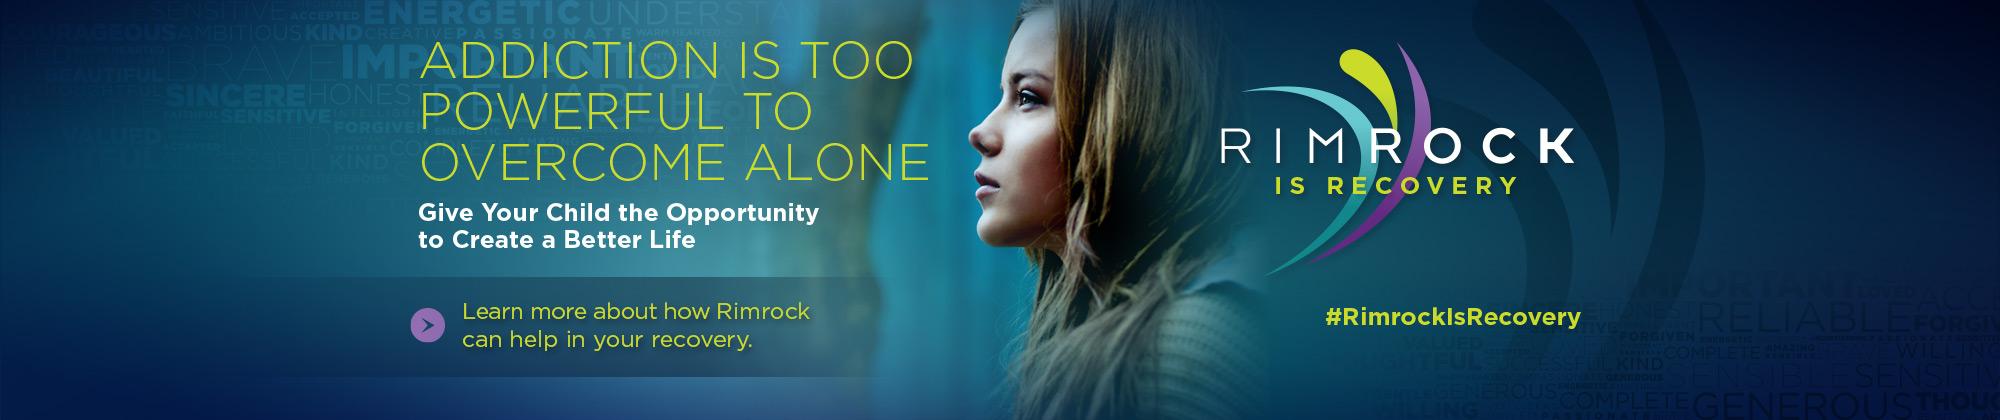 Rimrock Foundation - Rimrock is Recovery - Adolescents